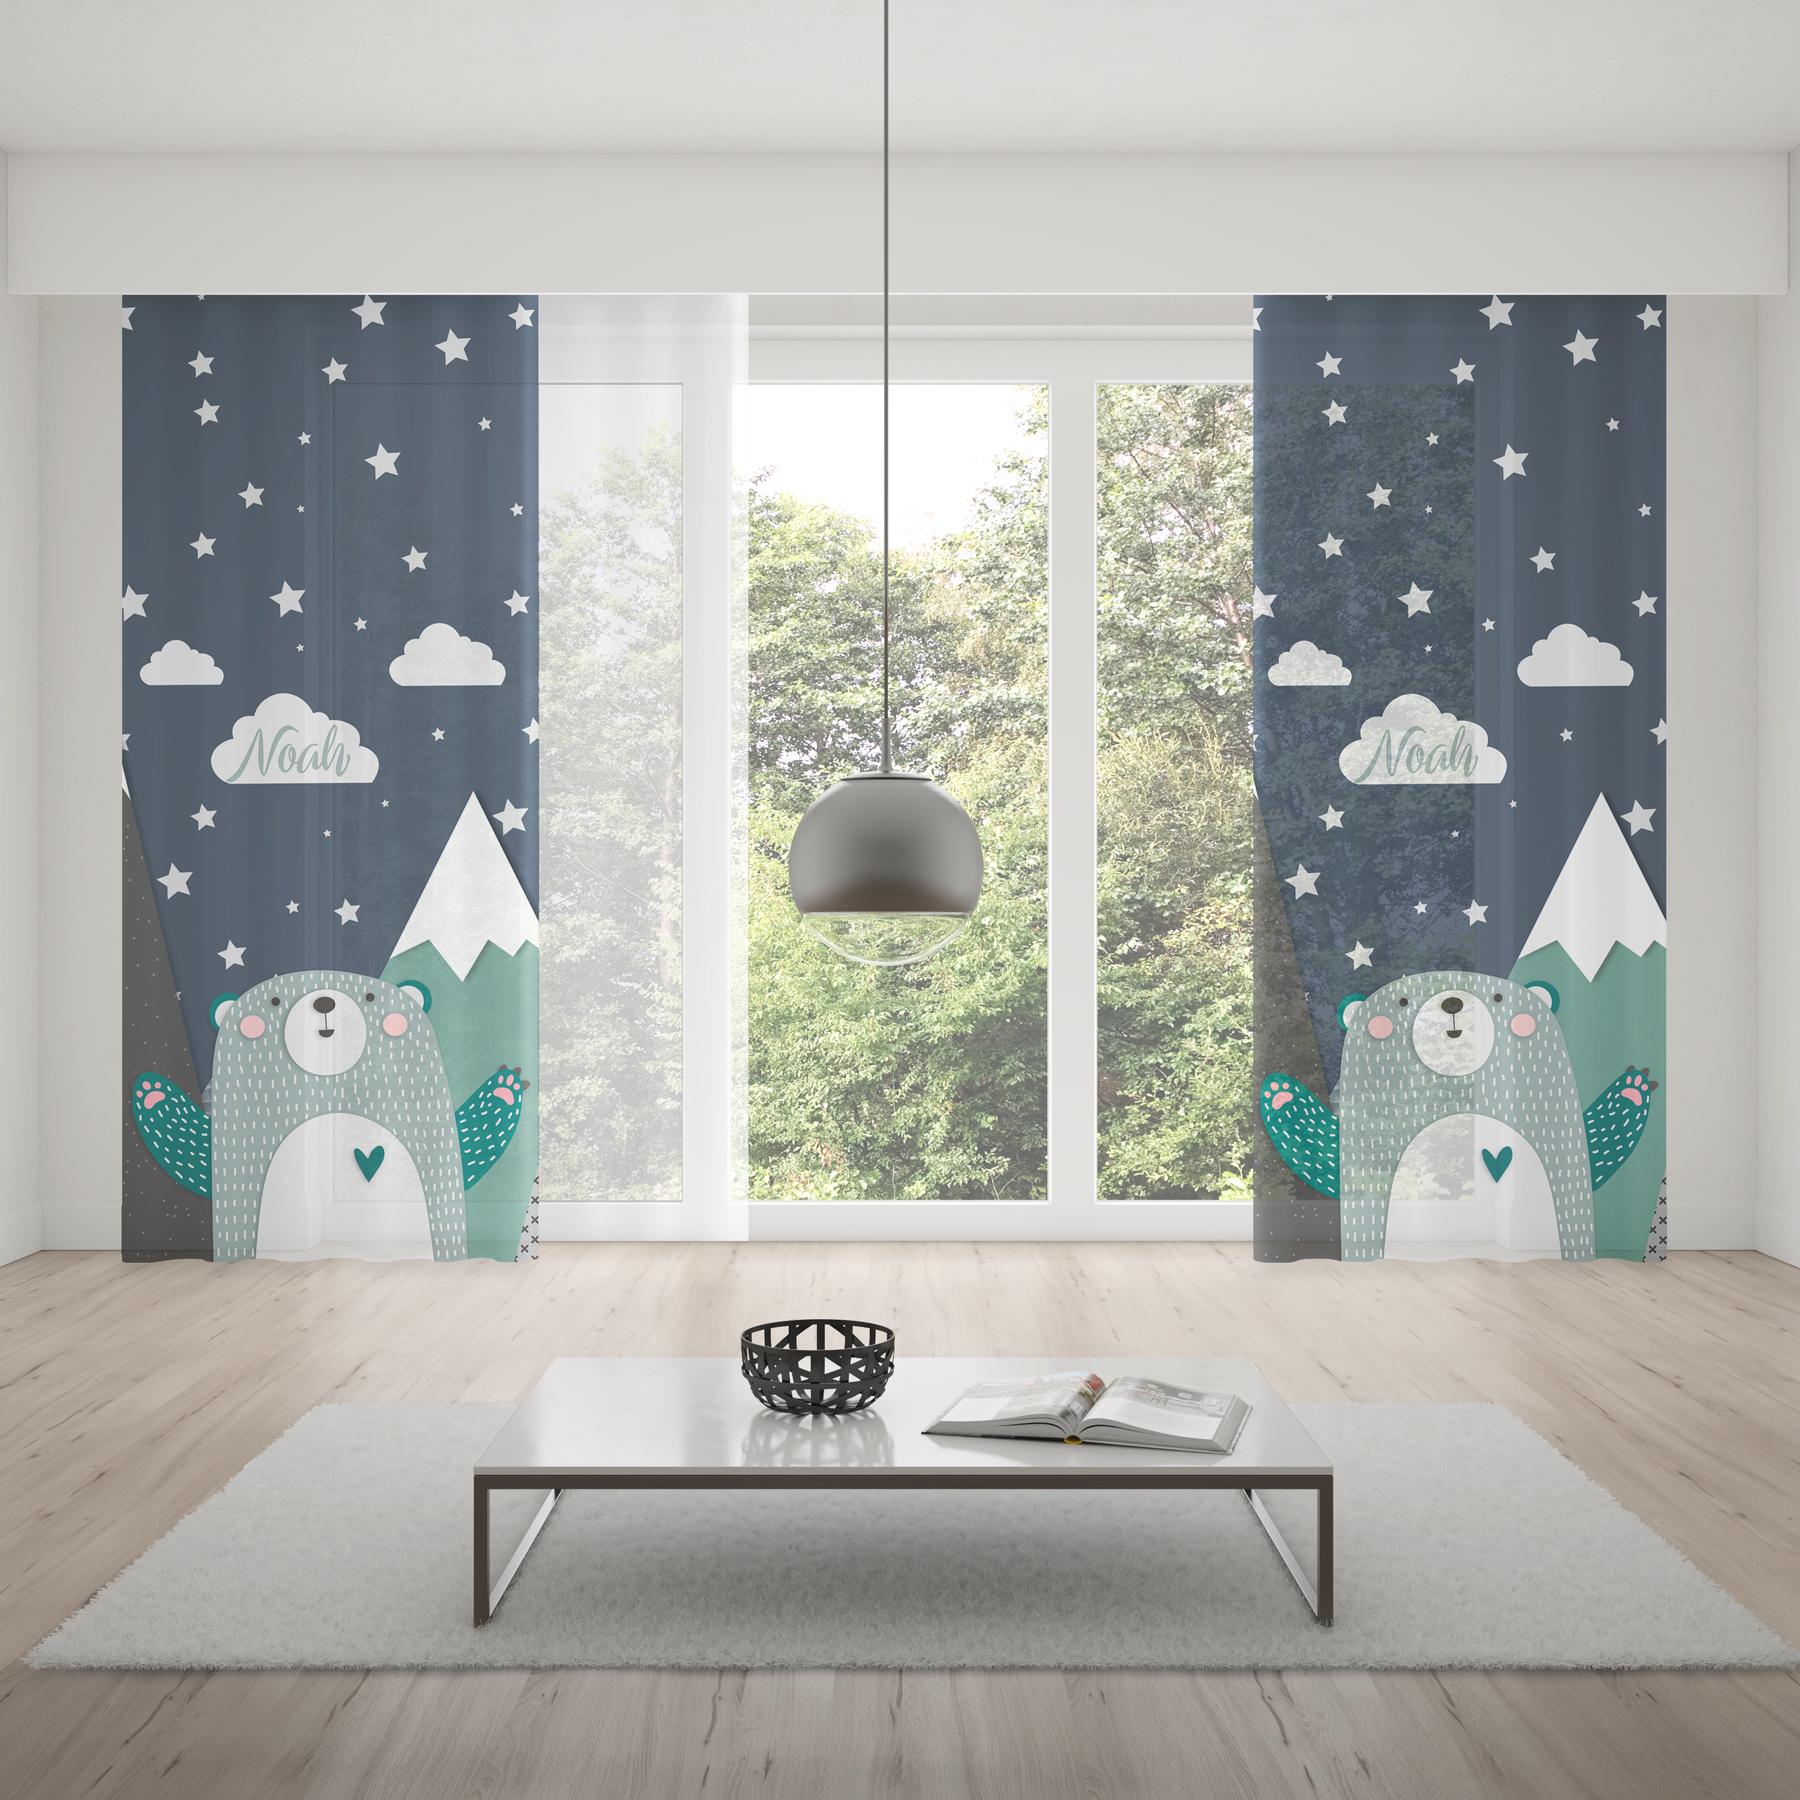 Графичен дизайн спално бельо